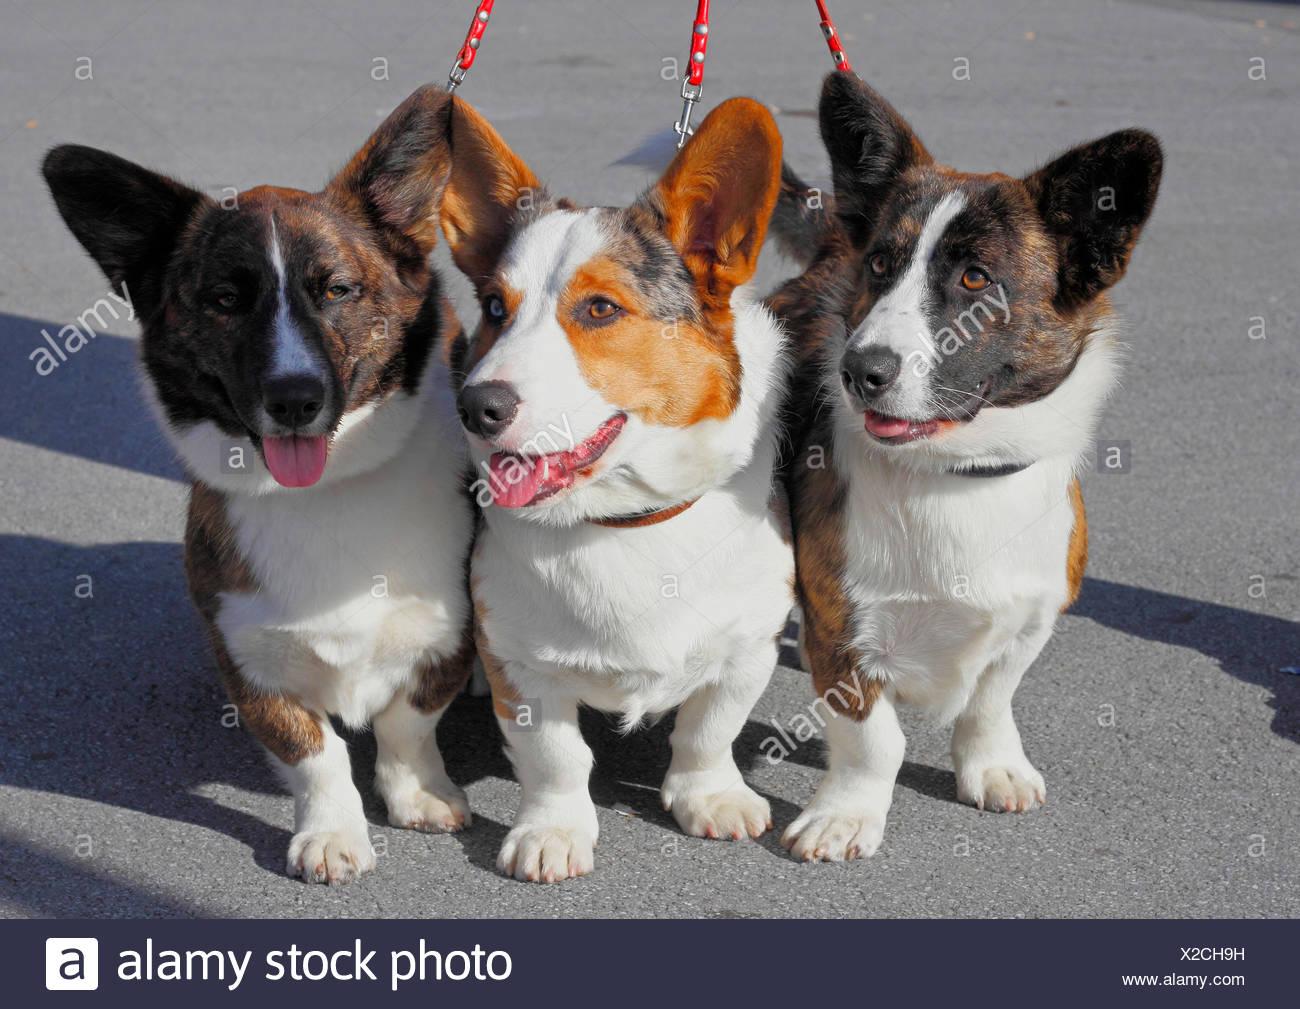 Welsh Corgi Pembroke (Canis lupus f. familiaris), three together leashed Welsh Corgi Pembrokes, Germany - Stock Image